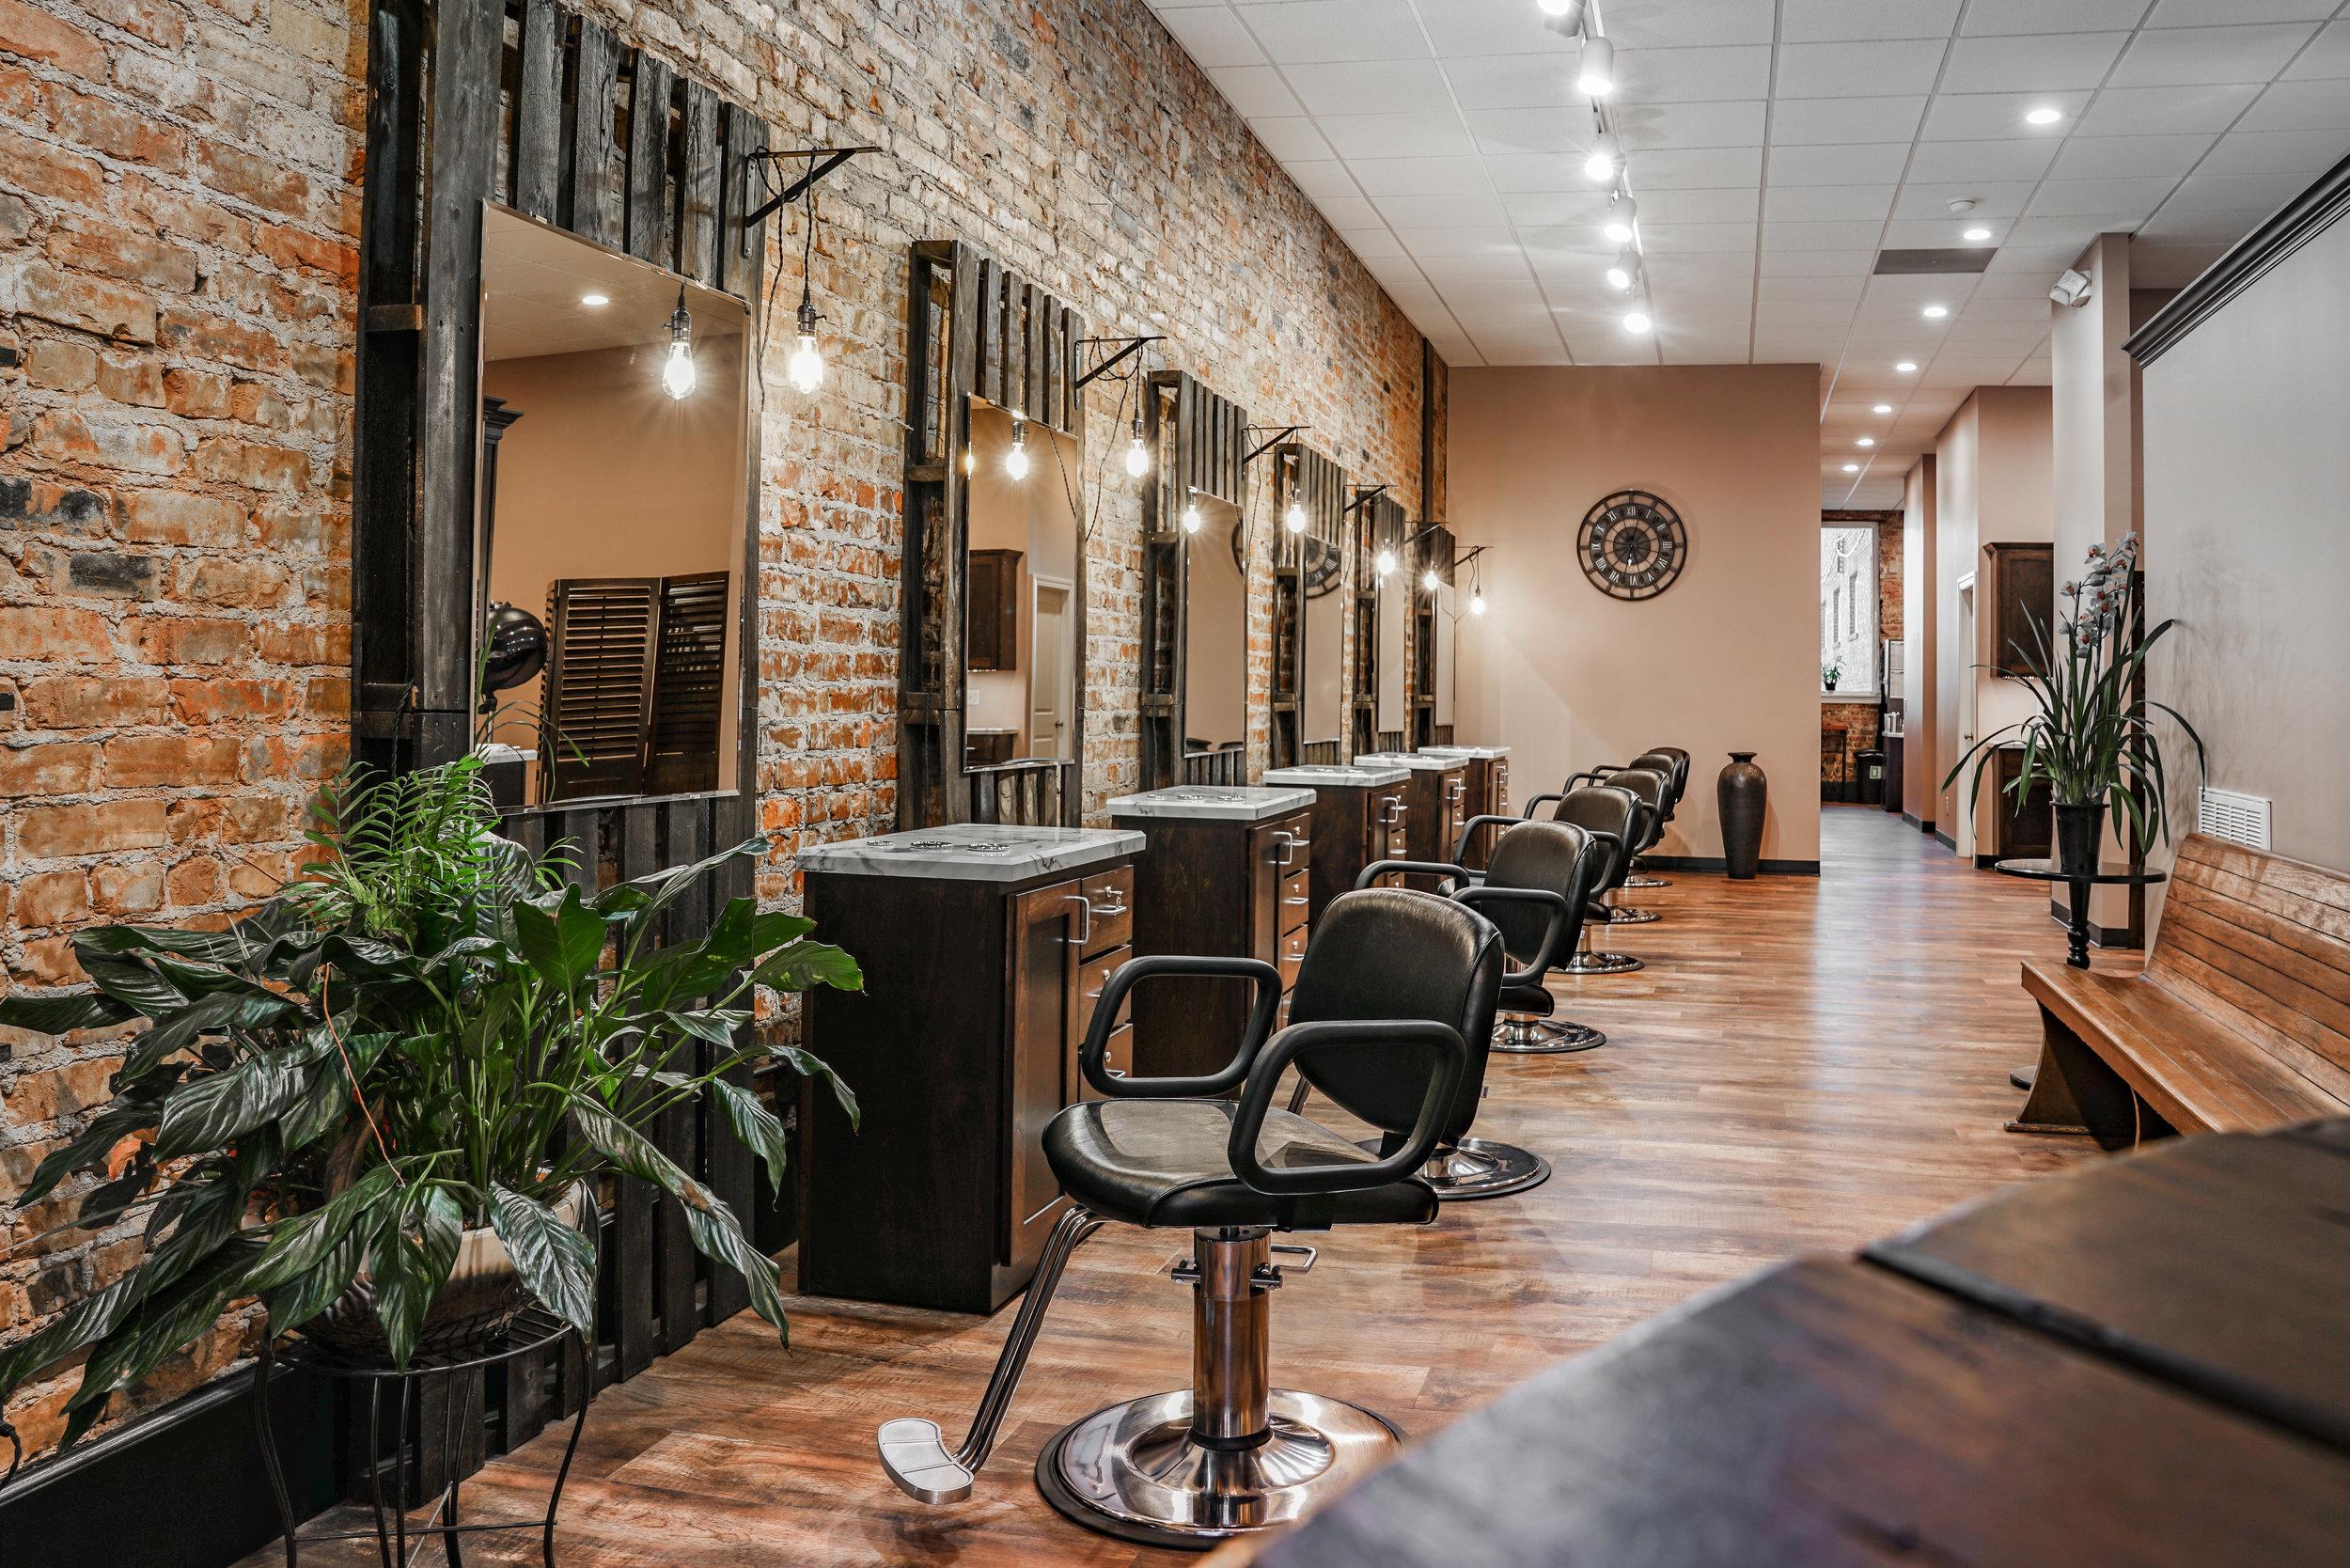 Aspire Salon